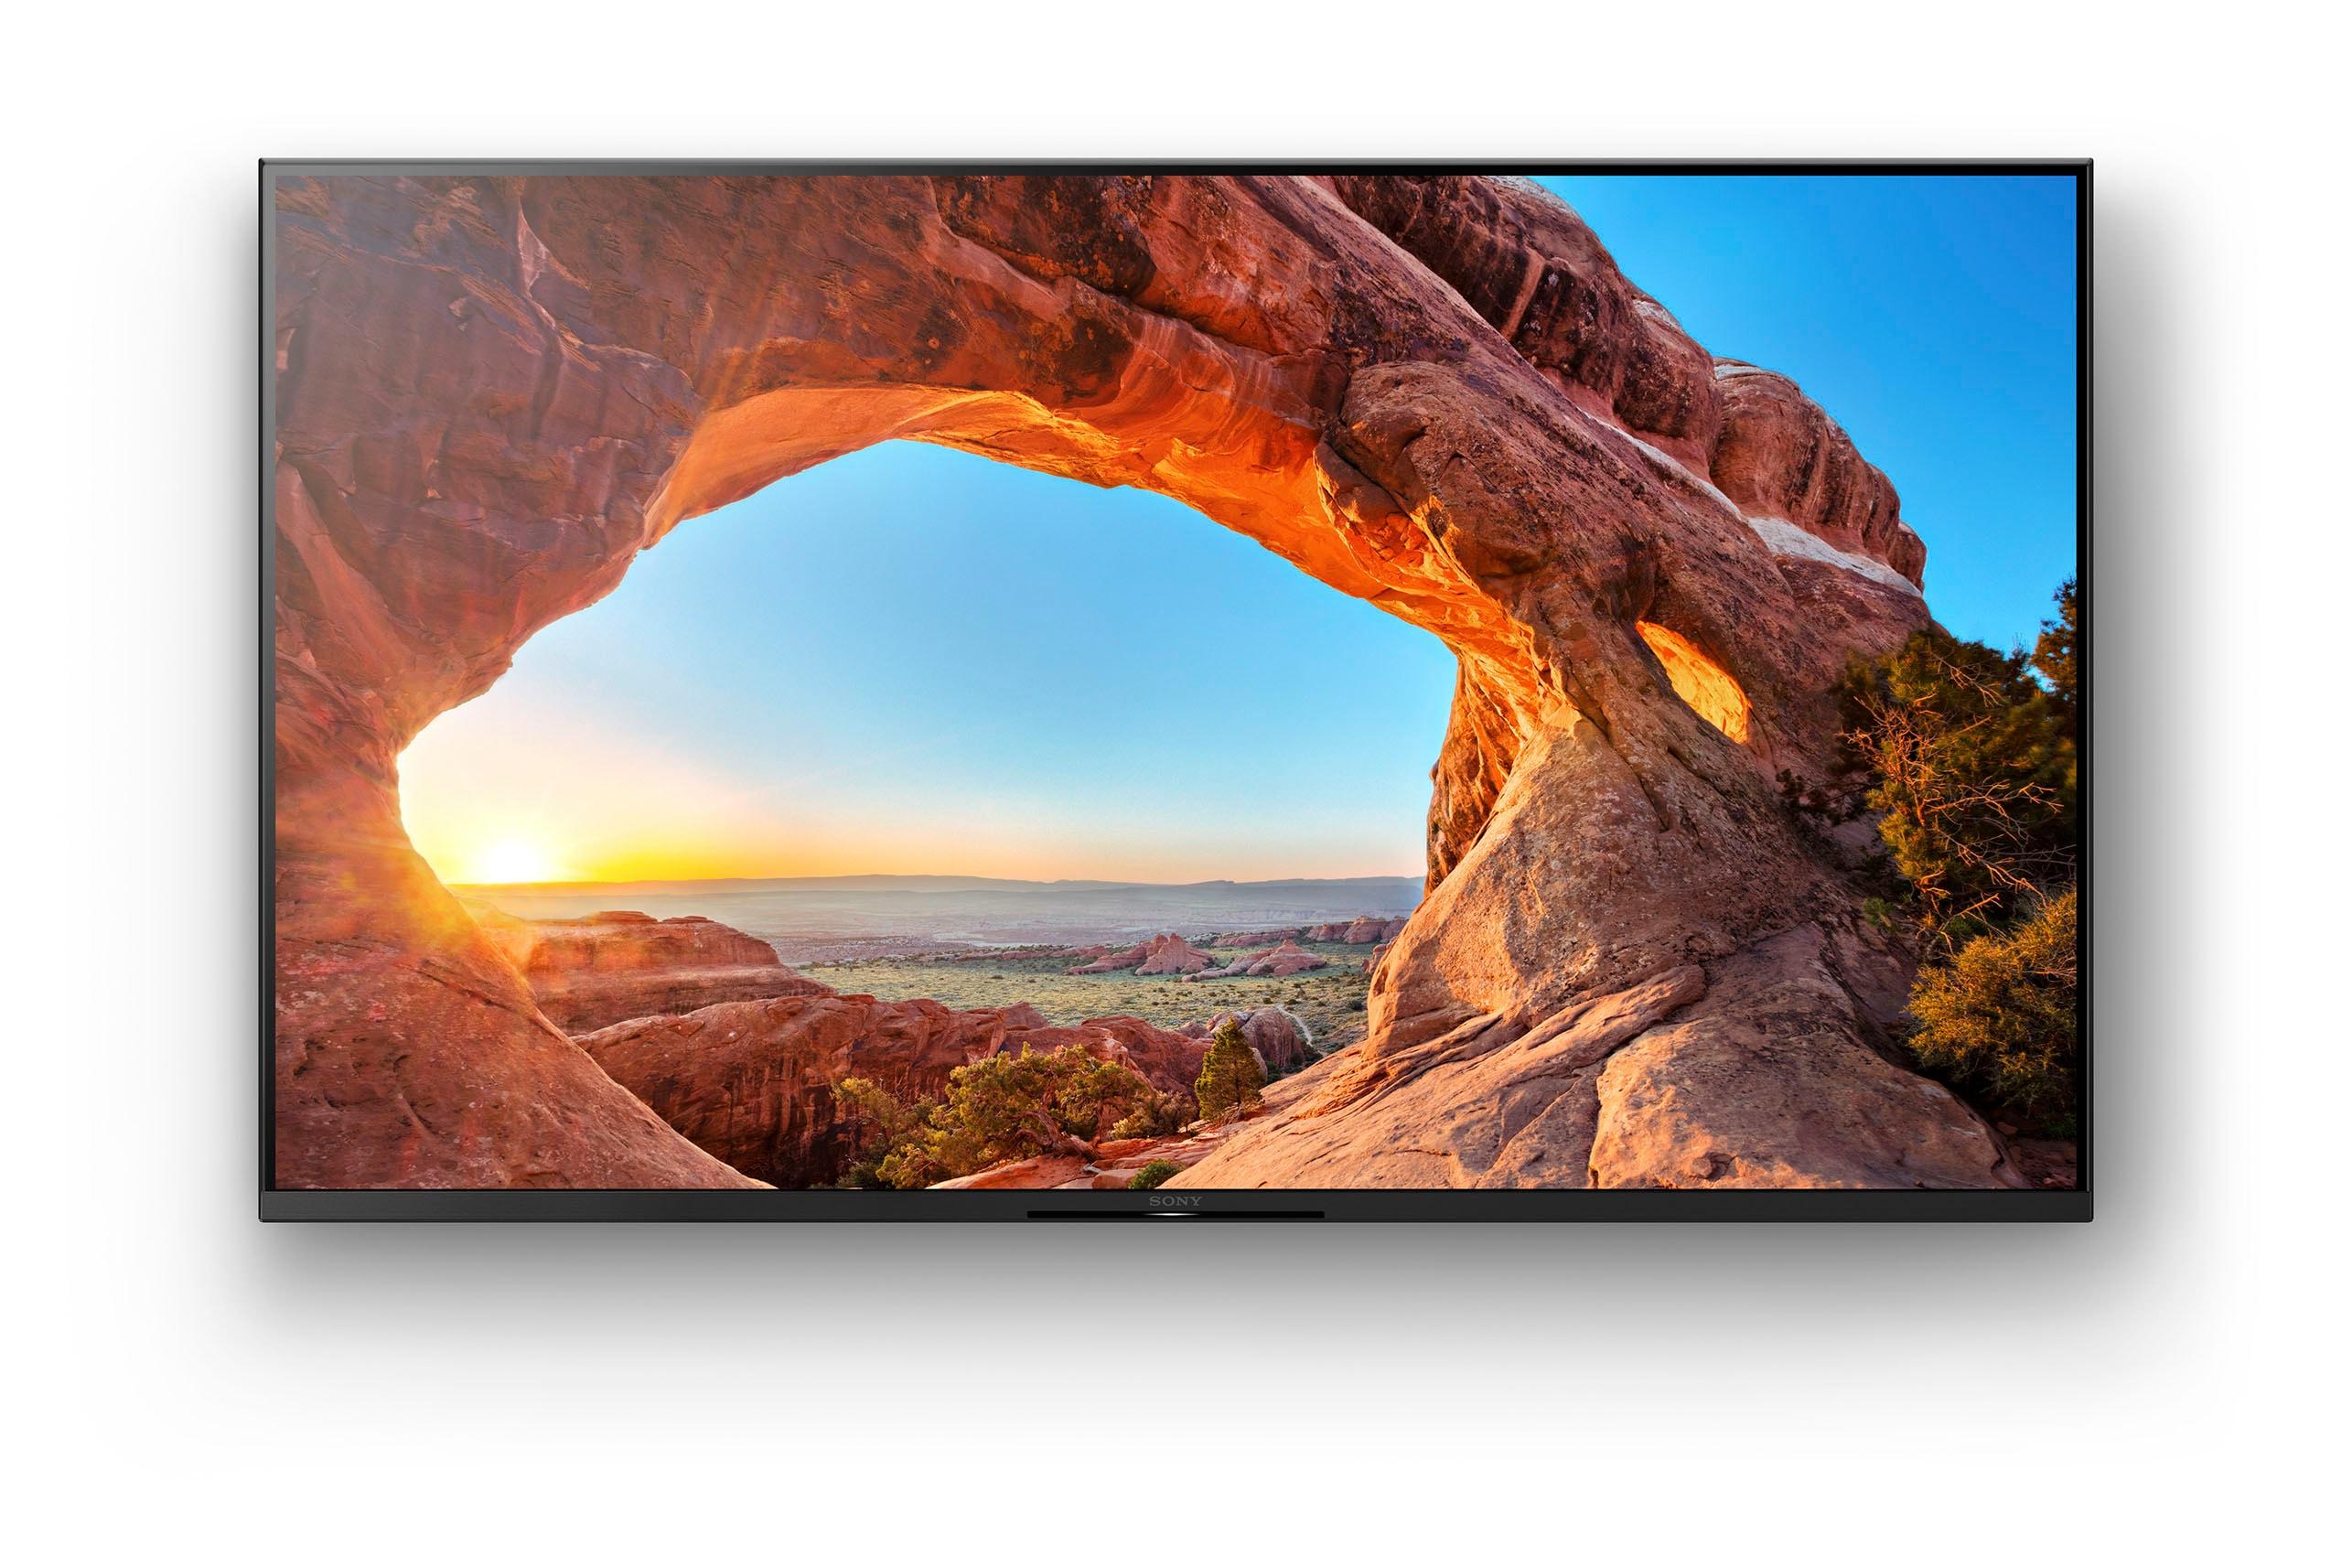 Sony LCD-LED Fernseher KD-50X85J , 126 cm 50 , 4K Ultra HD, Google TV, Smart TV